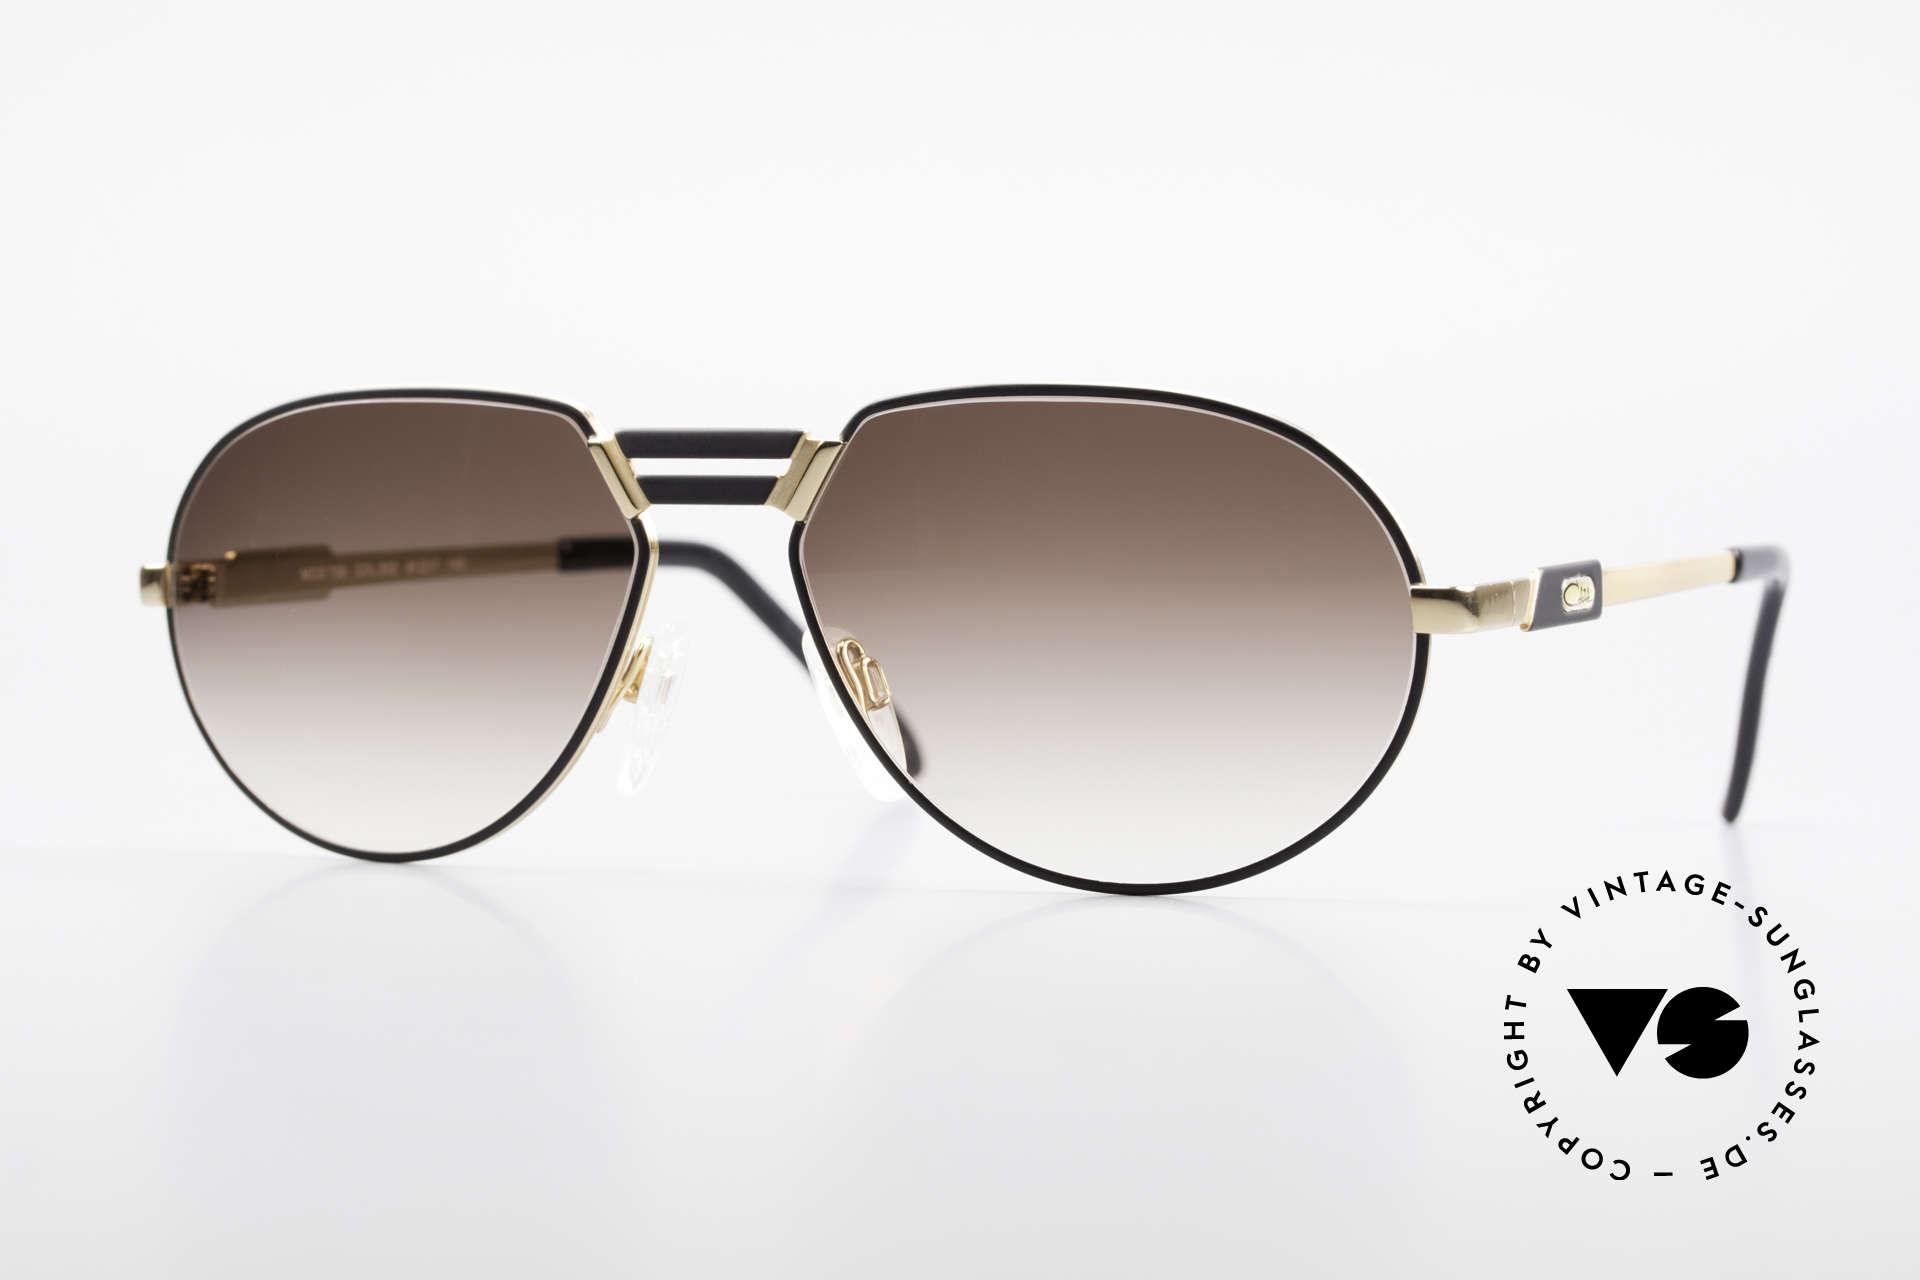 Cazal 739 Extraordinary Sunglasses XL, unique CAZAL sunglasses for men from 1989/90, Made for Men